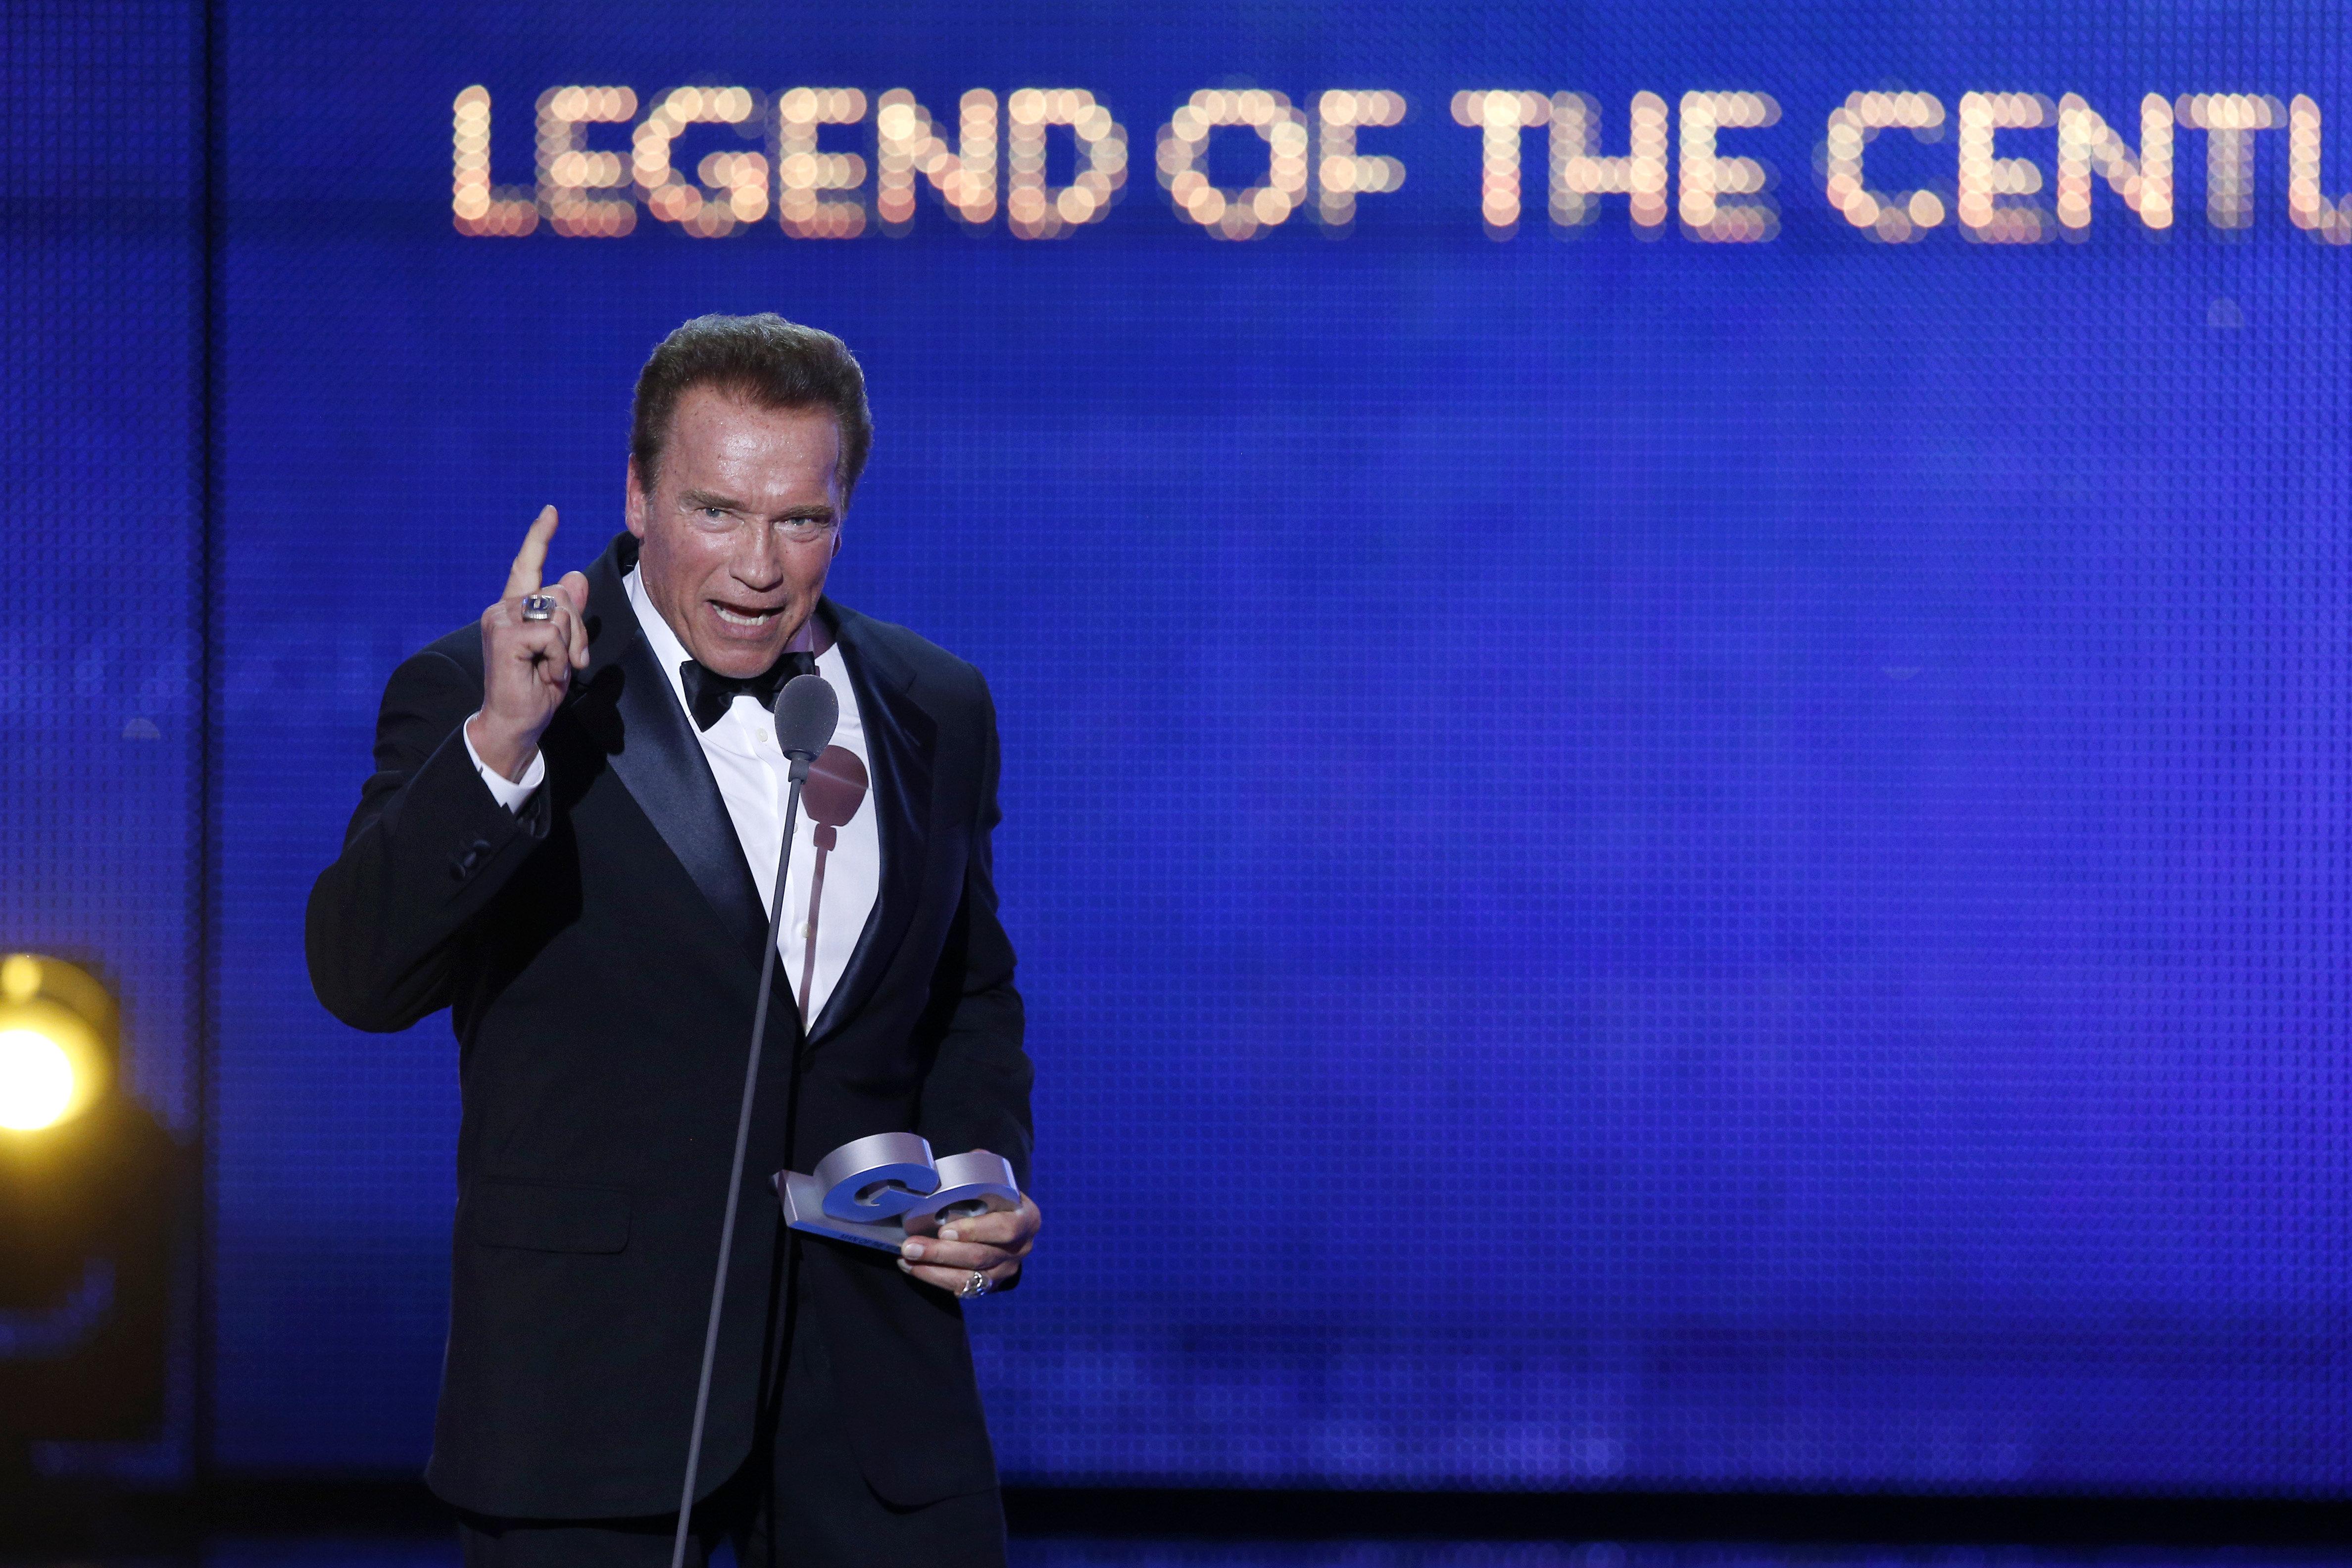 Arnold Schwarzenegger Picture Sends Redditors Into Photo-Editing